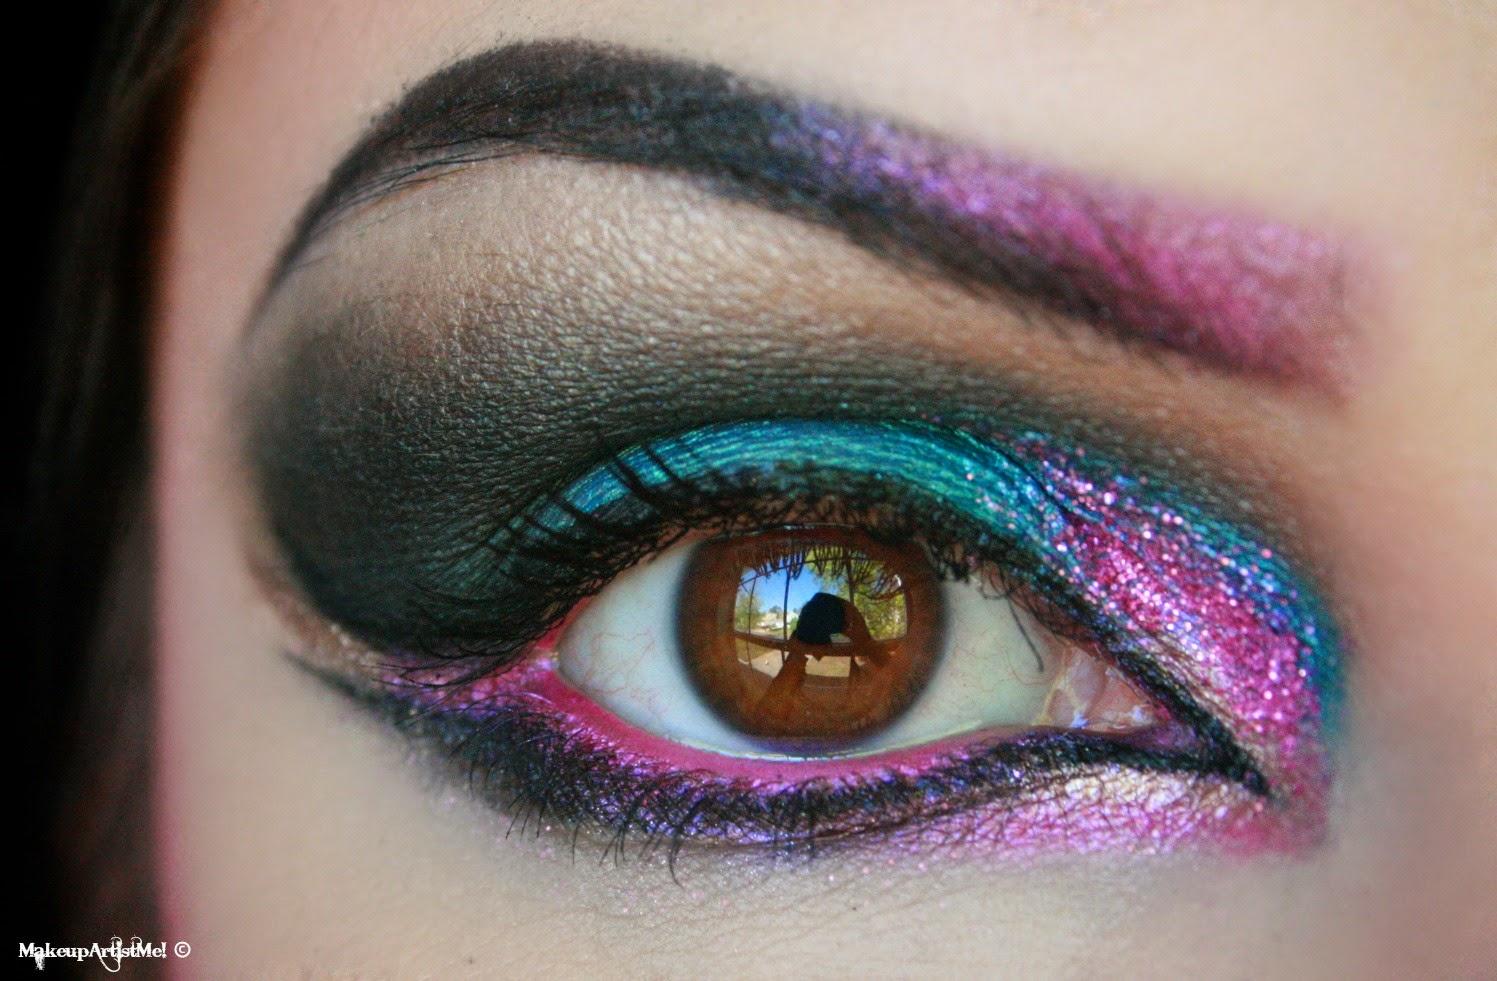 Make-up Artist Me!: Arabic Drama - Makeup Tutorial